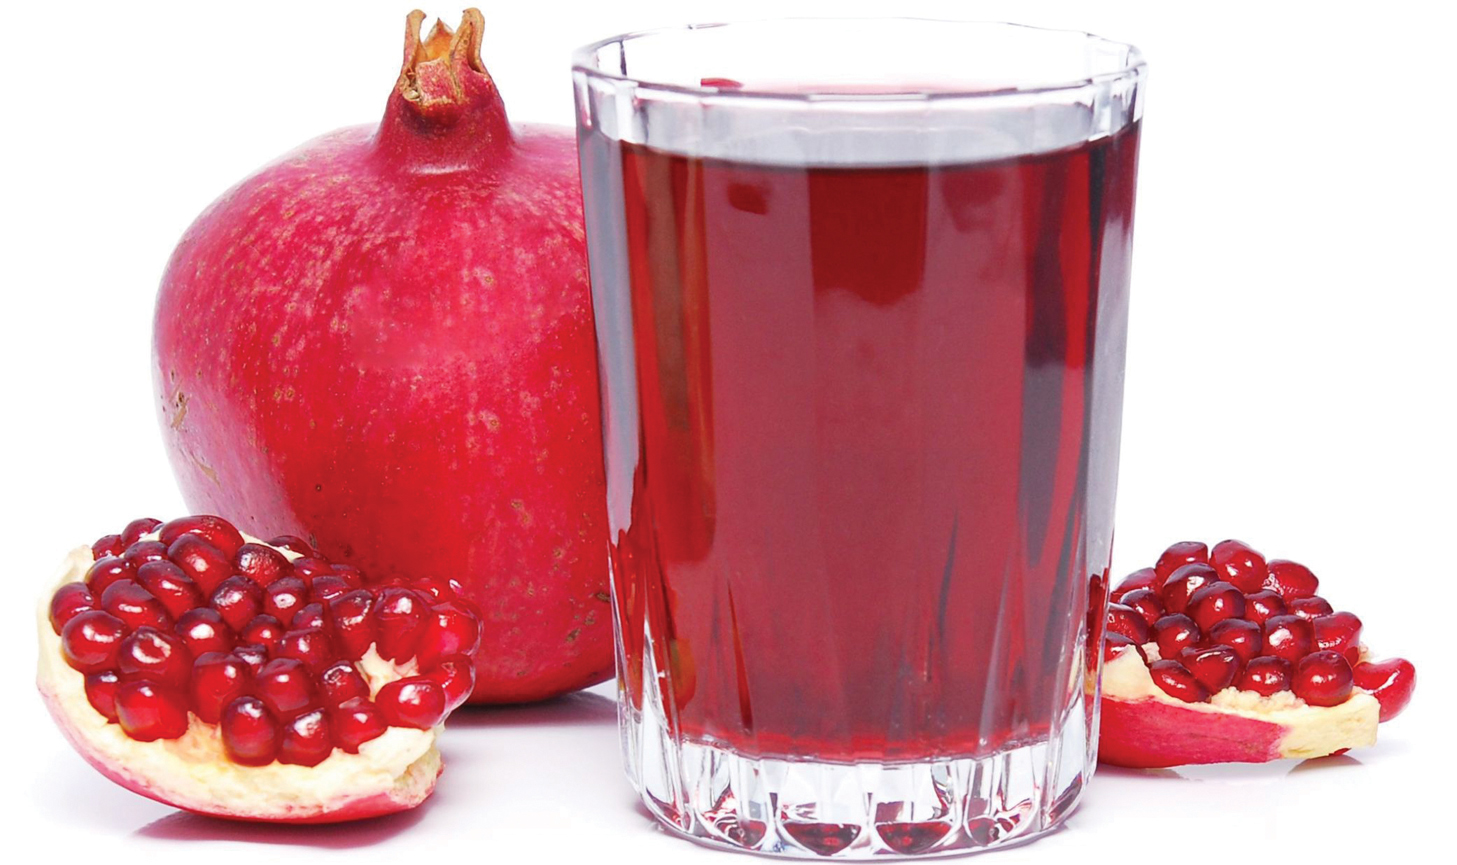 Pomegranate fights prostate cancer